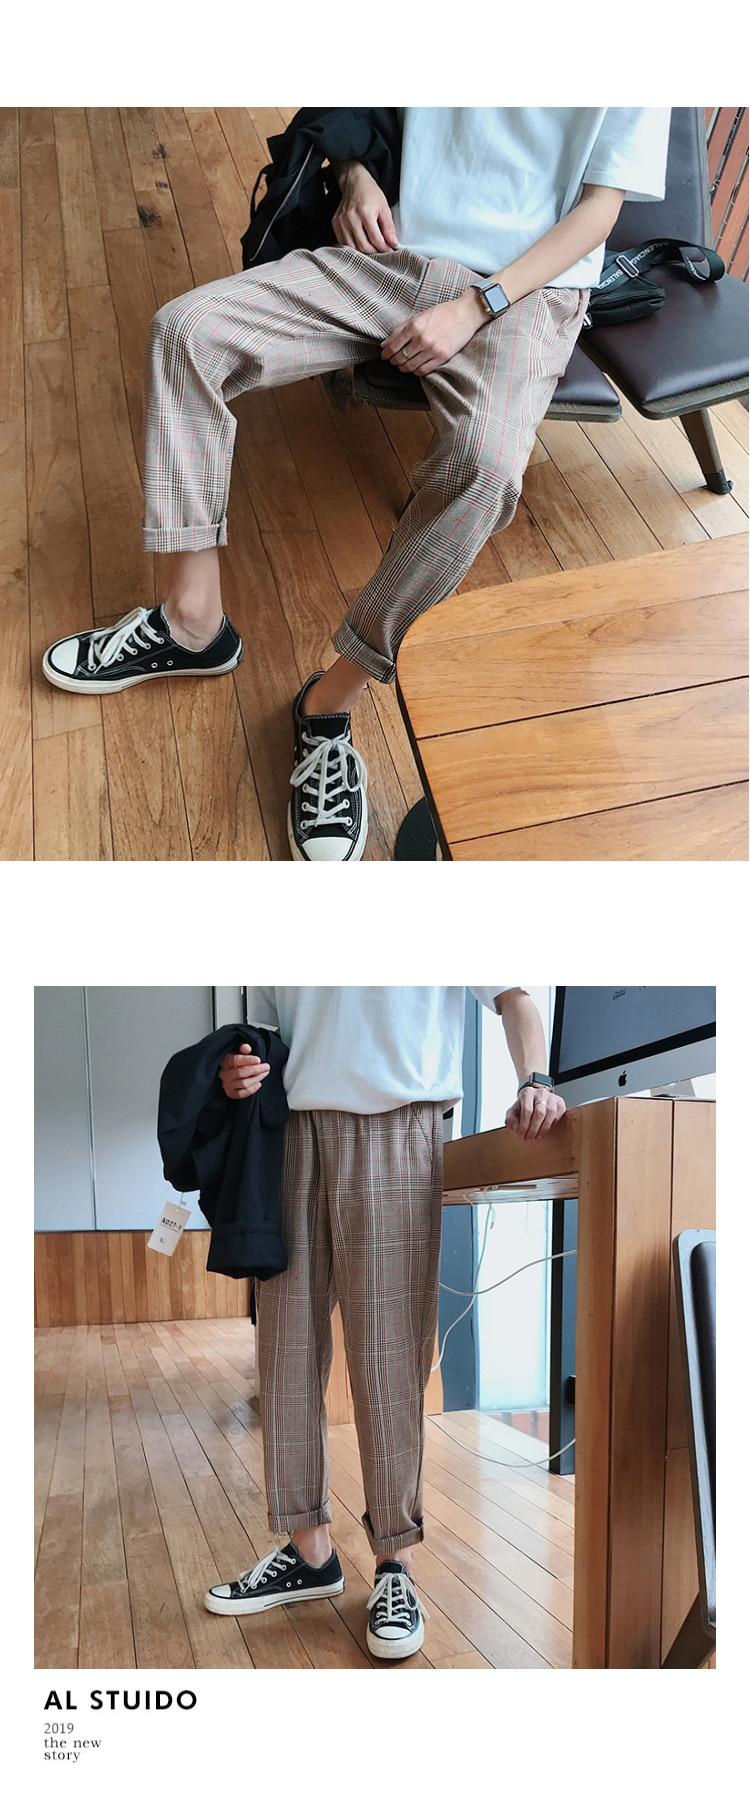 LAPPSTER Streetwear Yellow Plaid Pants Men Joggers 19 Man Casual Straight Harem Pants Men Korean Hip Hop Track Pants Plus Size 15